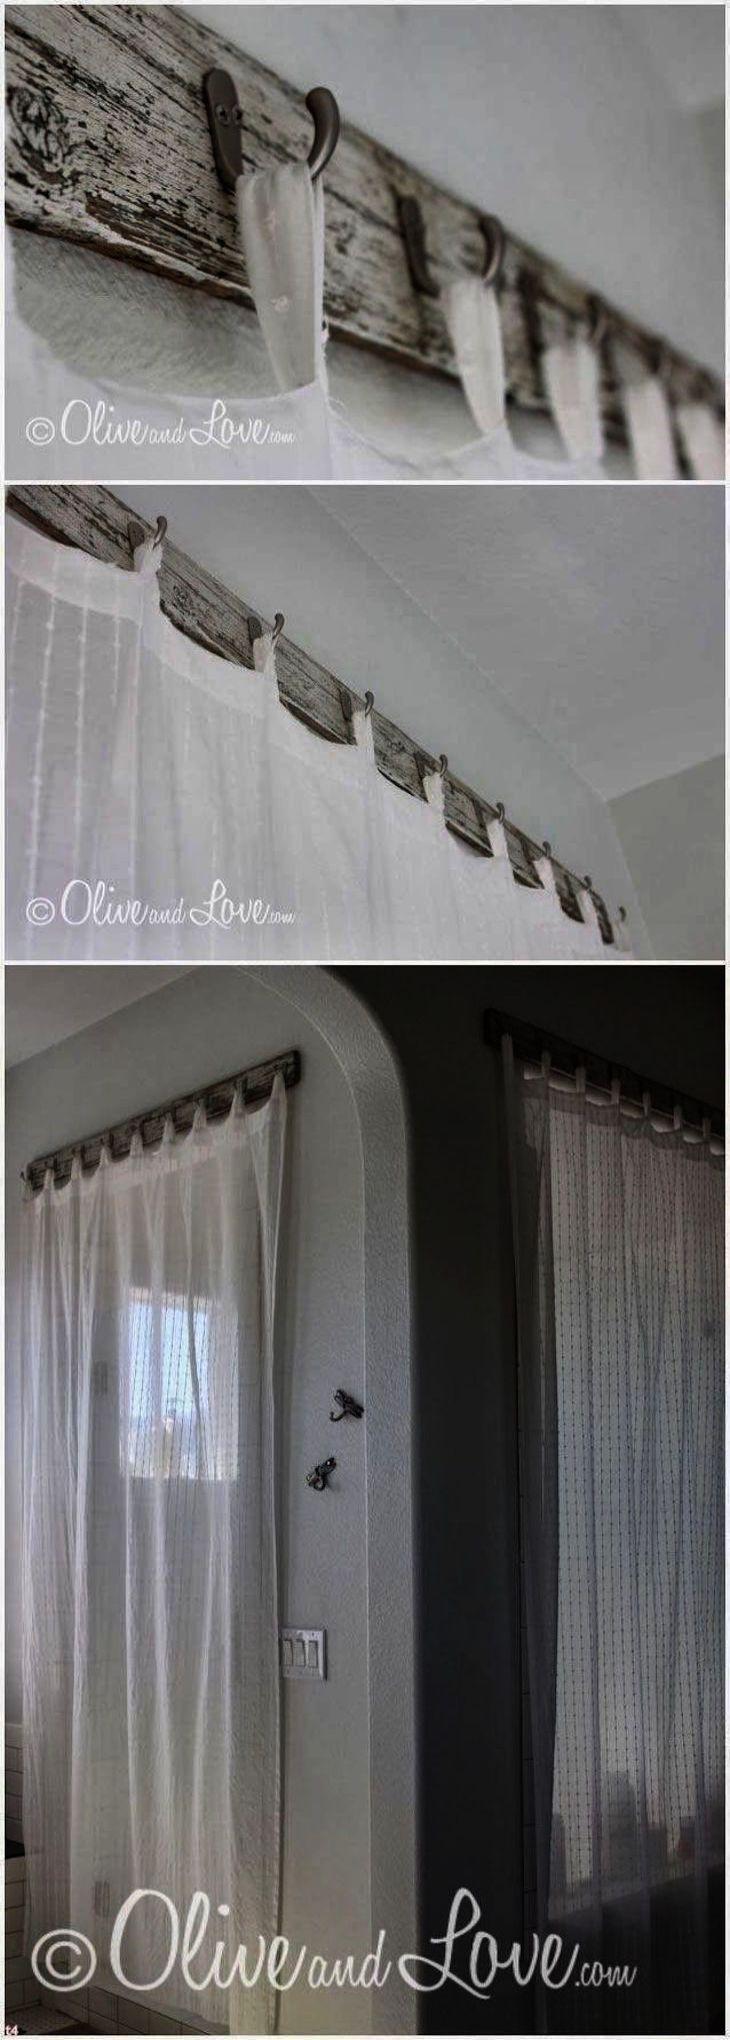 DIY Home Decorating BlogsDIY Home Interior Design